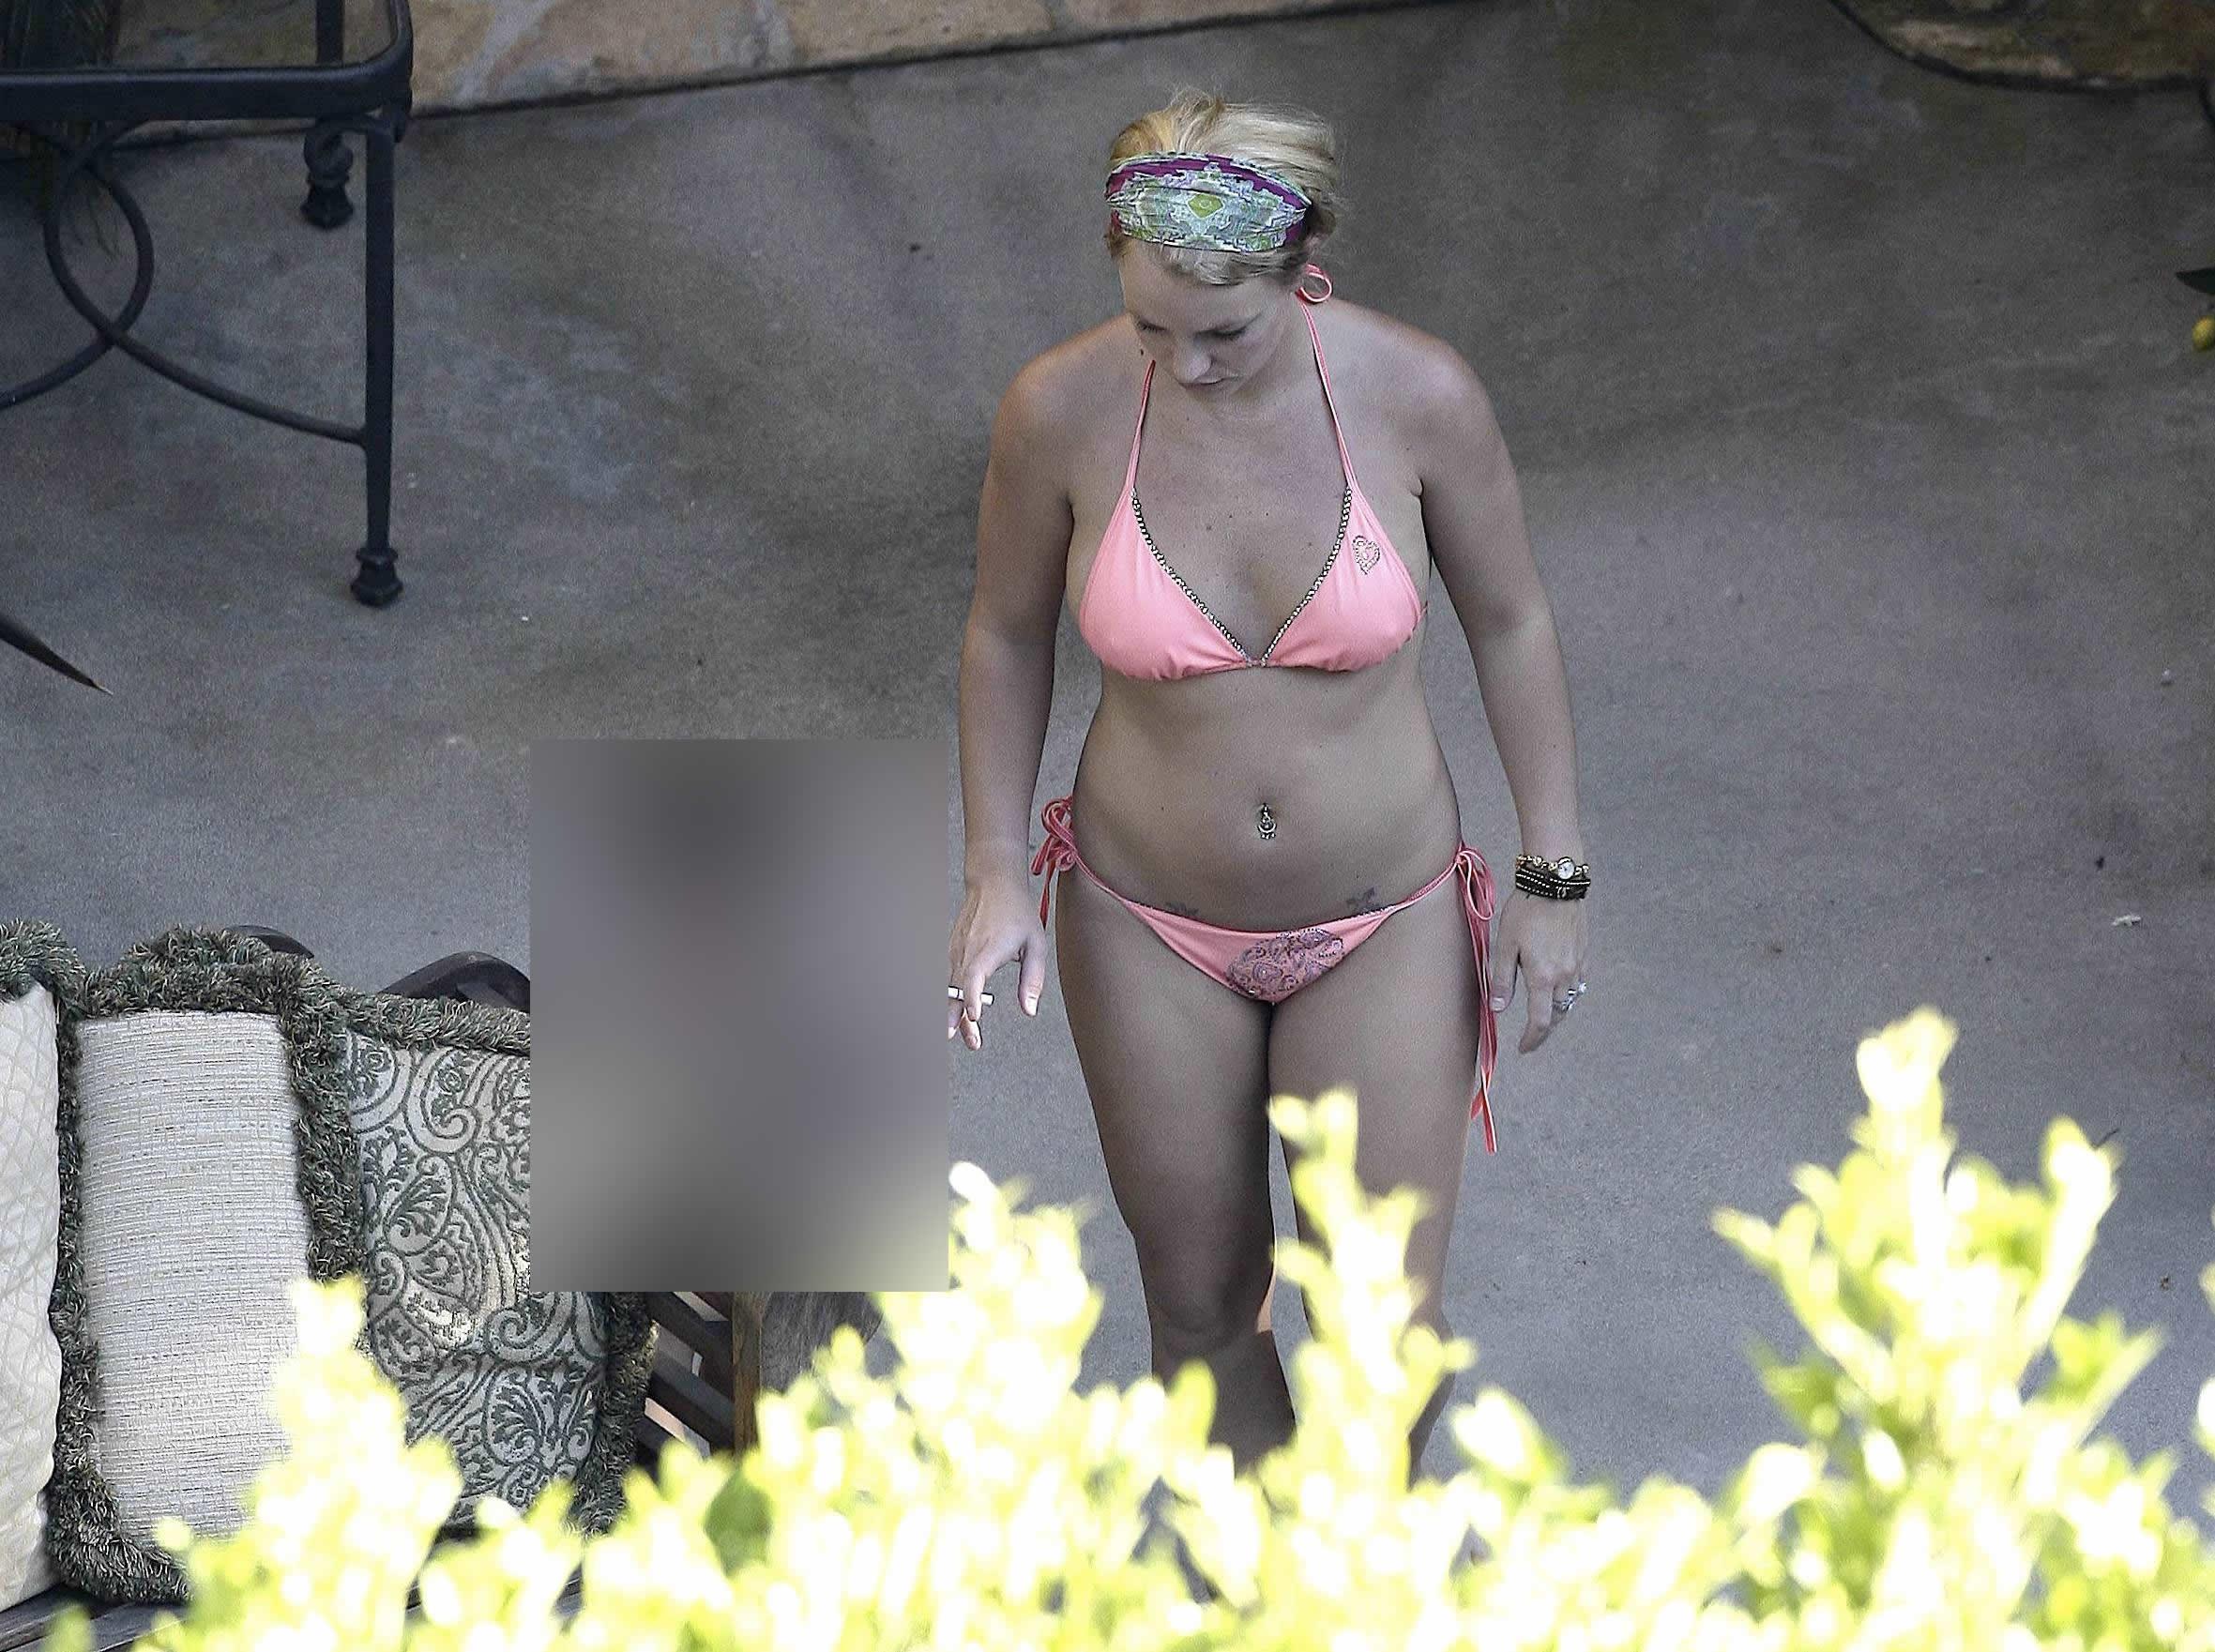 55545_Kosty555.info_Britney_Spears_11_122_508lo.jpg